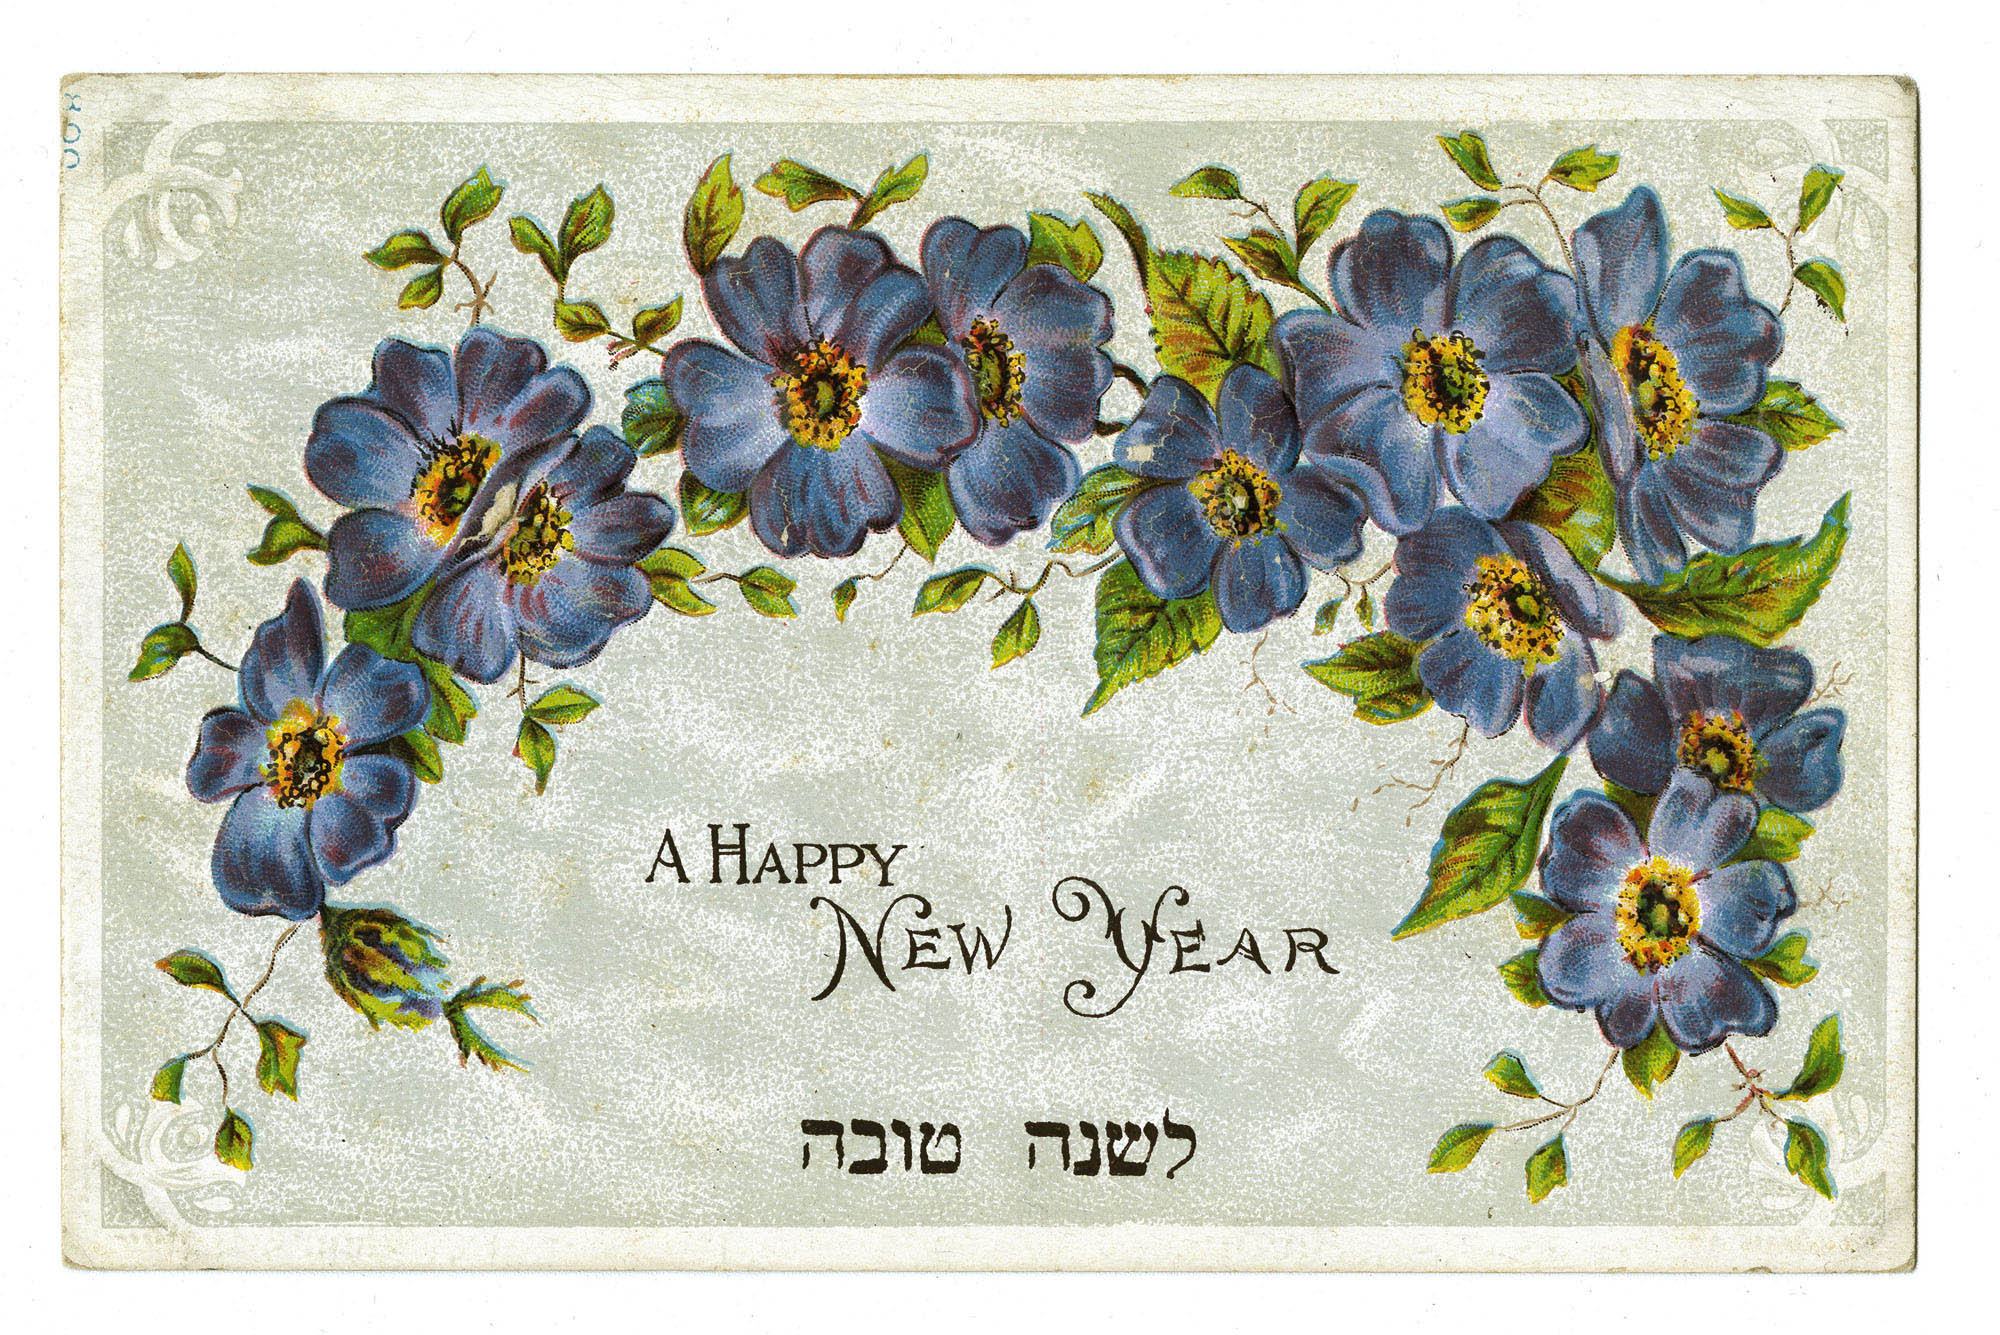 A Happy New Year / לשנה טובה